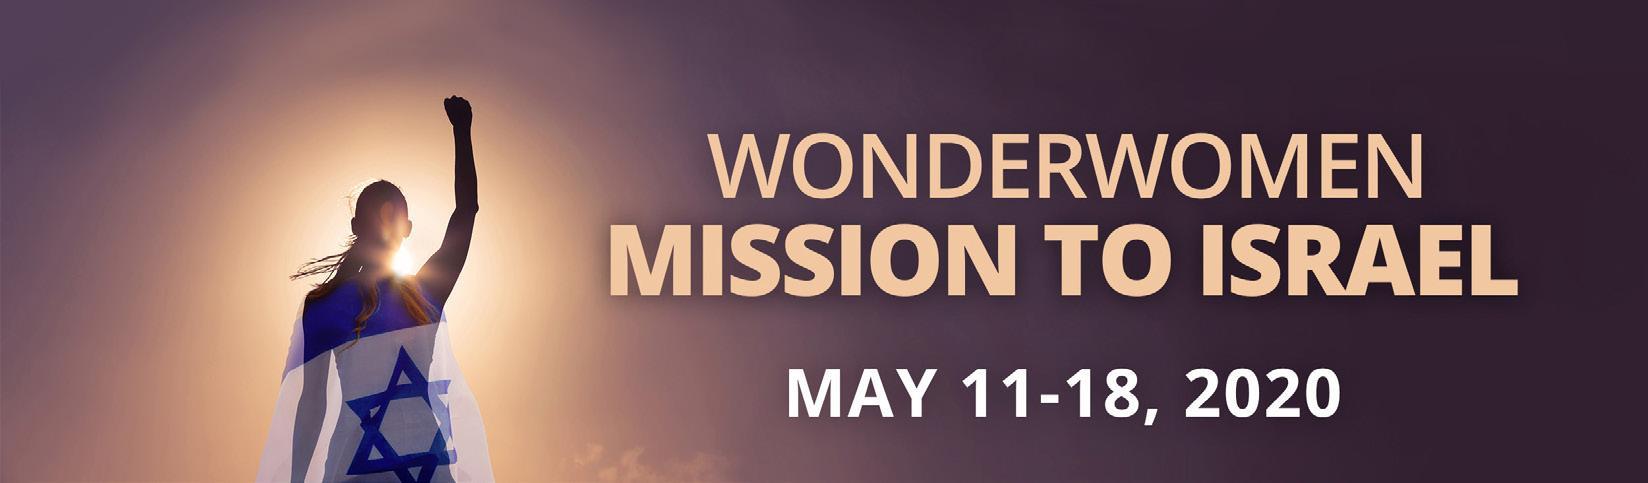 Page 17 of Wonderwomen Mission To Israel